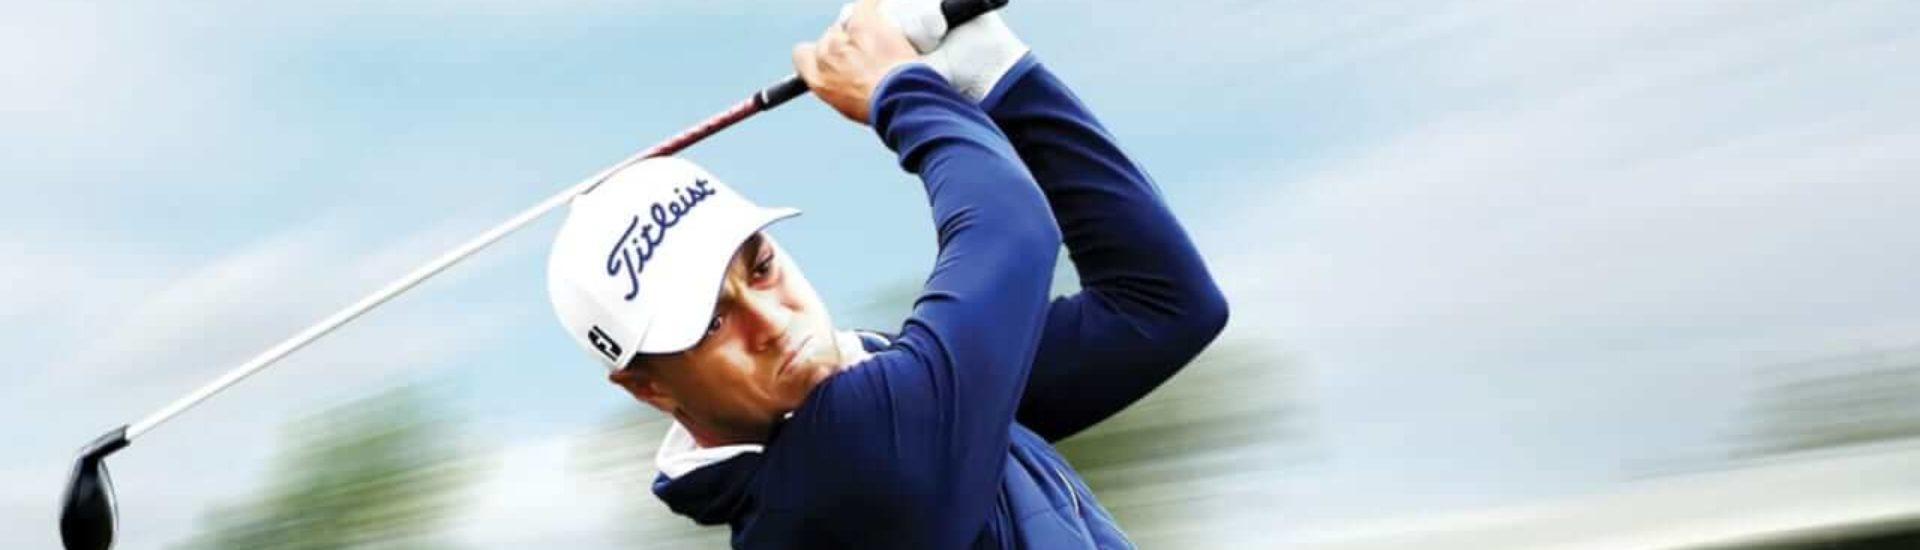 PGA Tour 2K21: Golfspaß mit hohem Simulationsanspruch